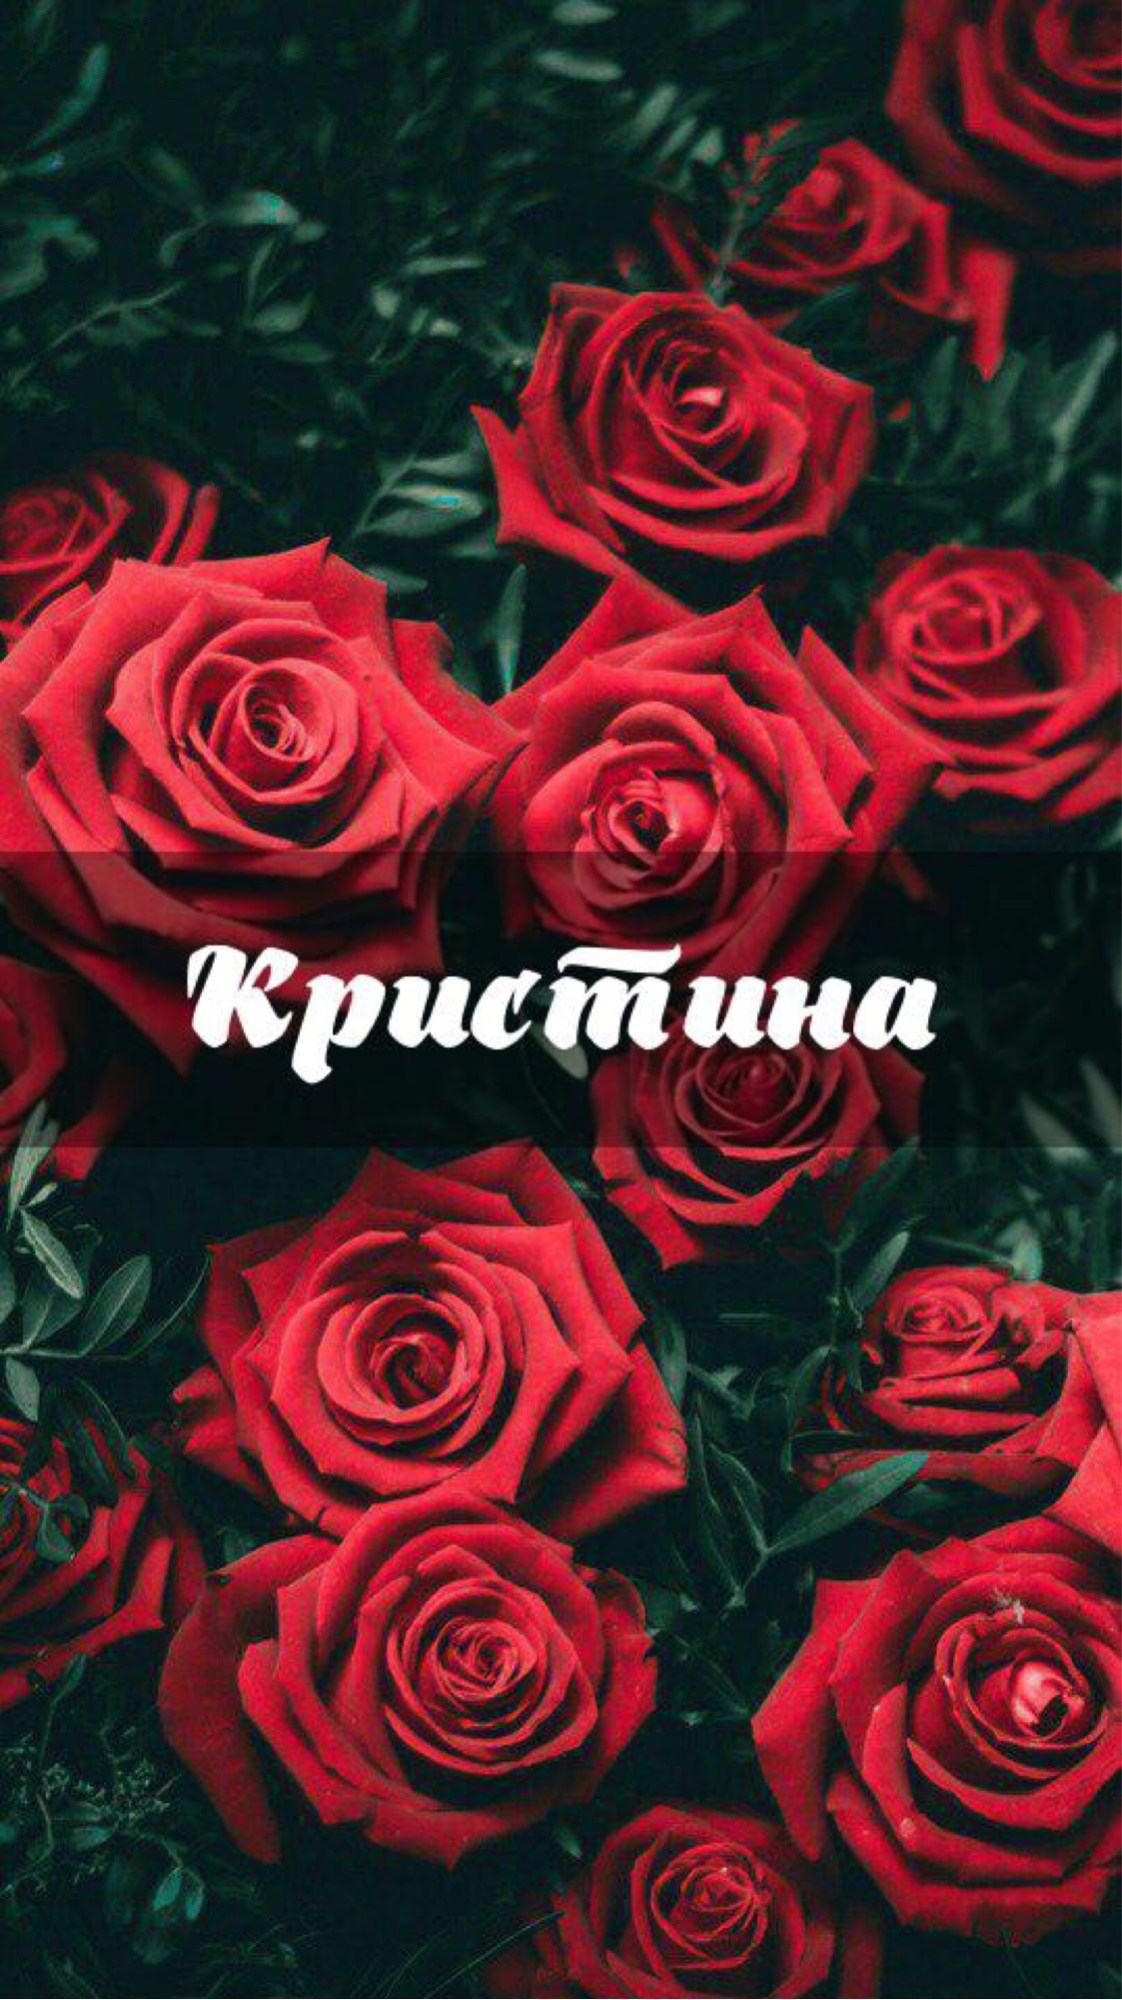 kristina290601's Cover Photo